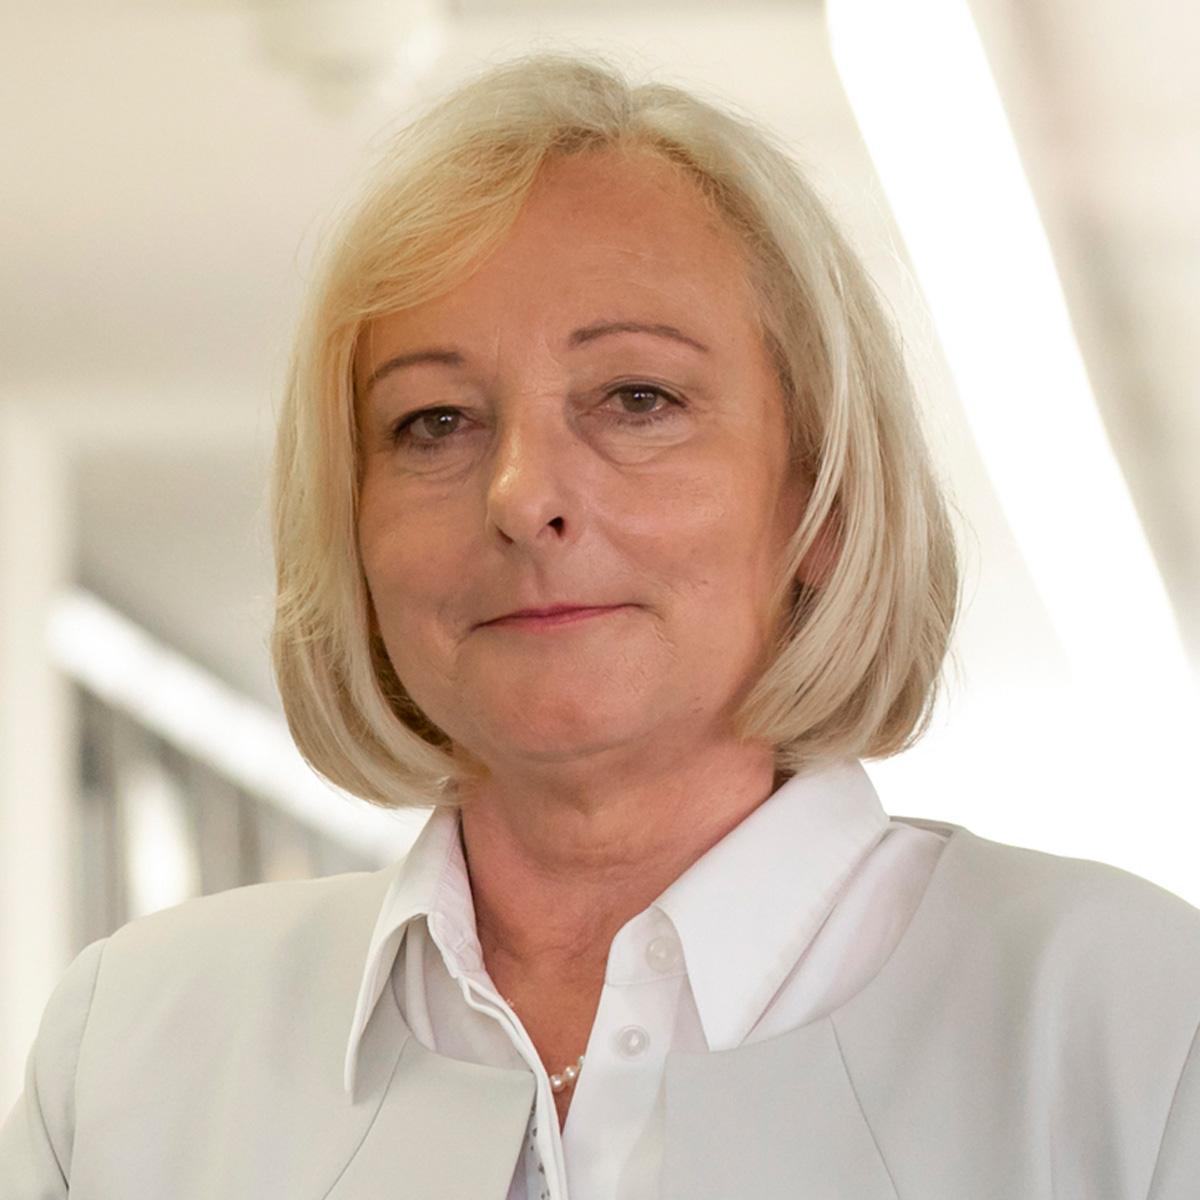 Dr. Ulrike Krießmann